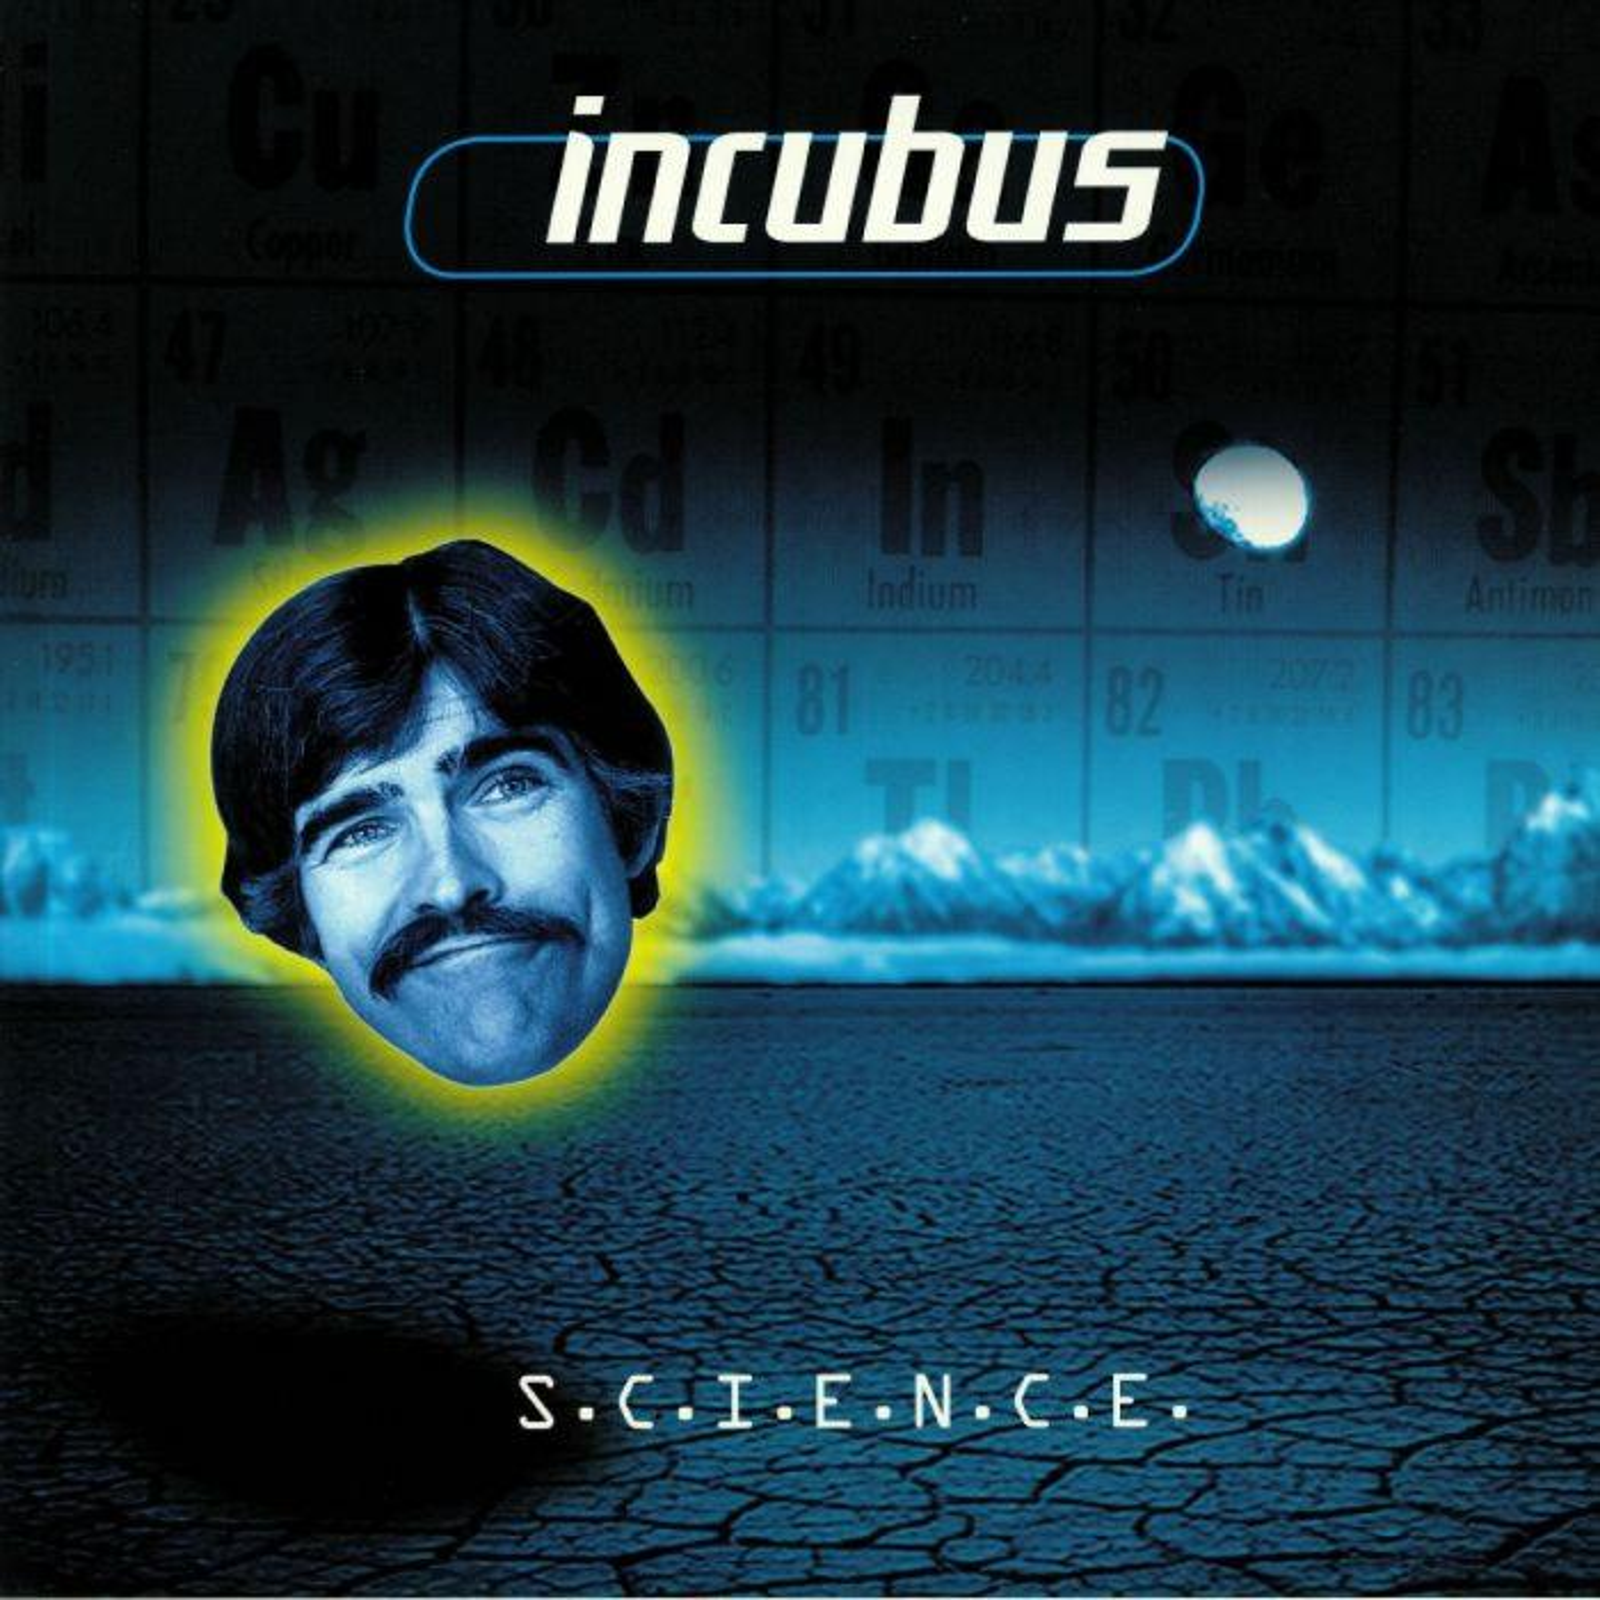 Виниловая пластинка Incubus–S.C.I.E.N.C.E. (2LP)